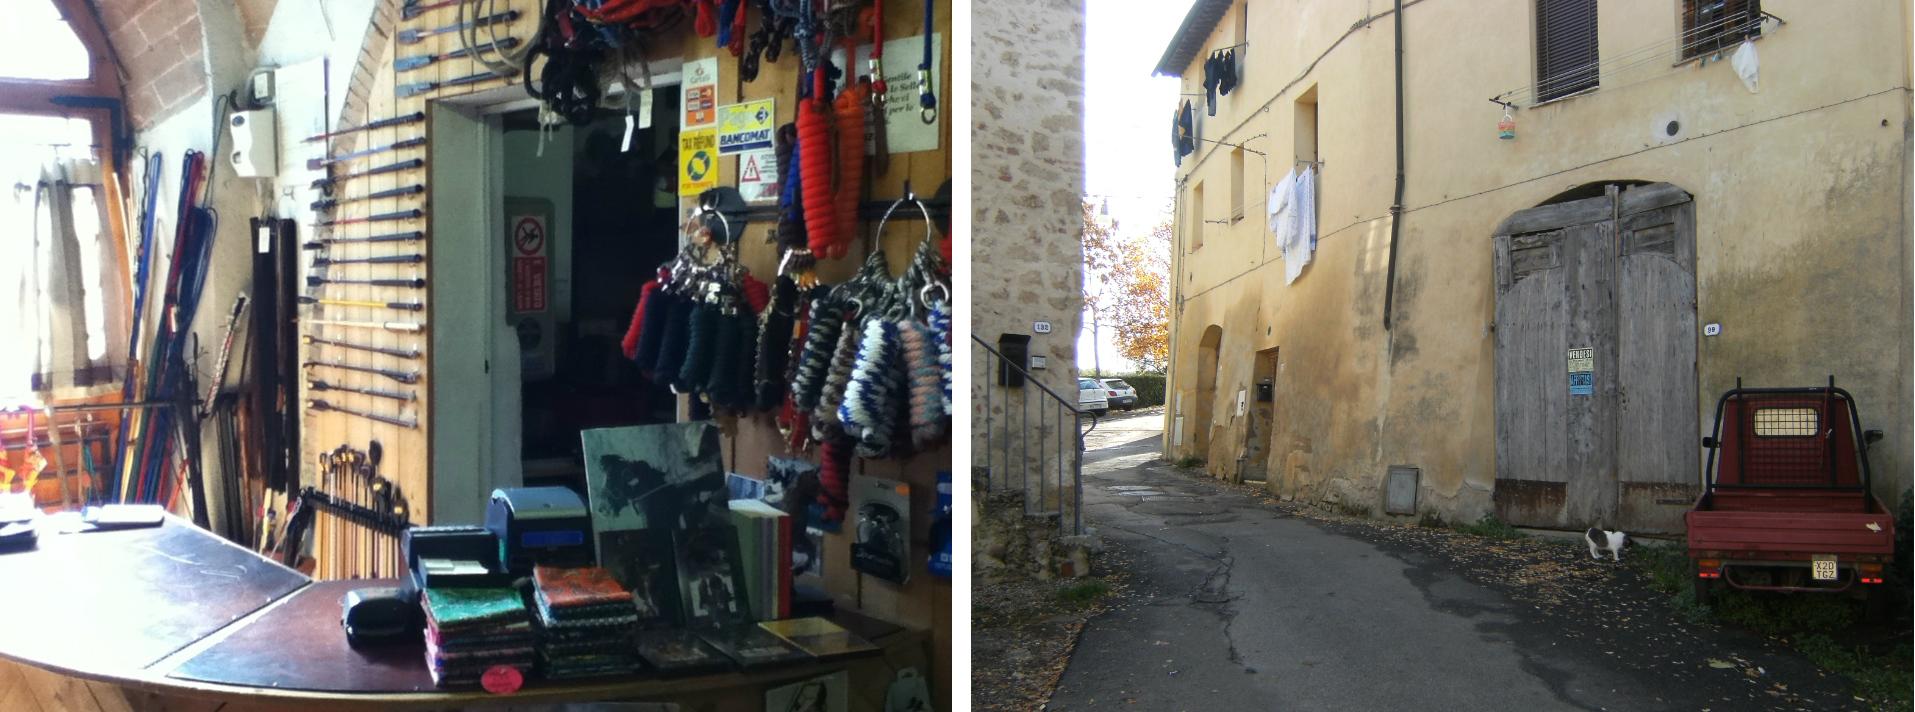 Italy - Colle di val dElsa - Horses - 1.1